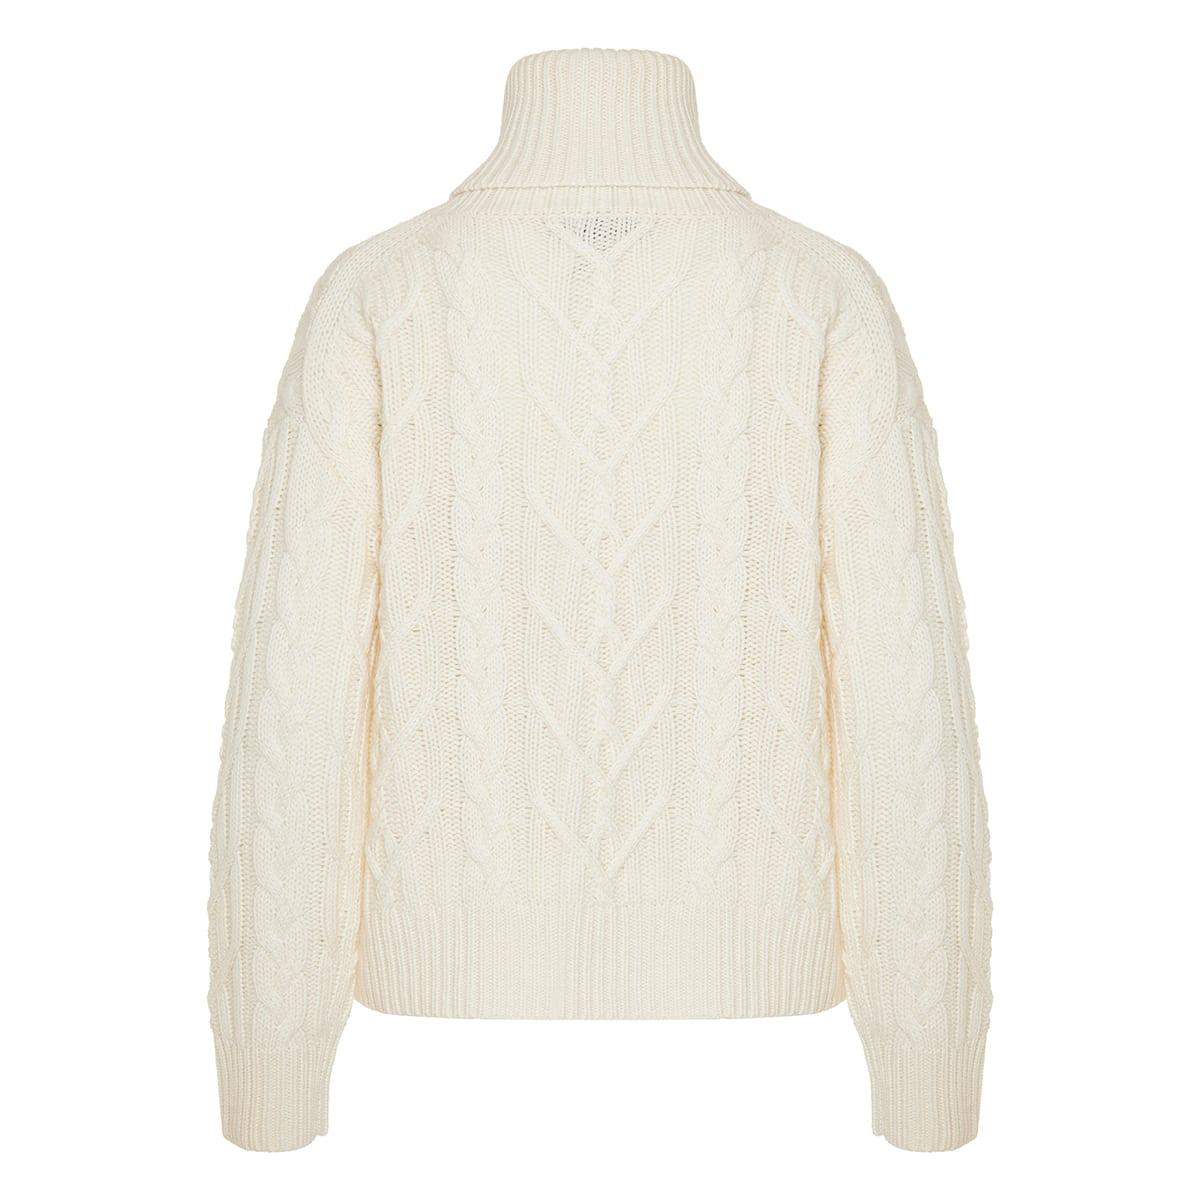 Gigi cable-knit turtleneck sweater